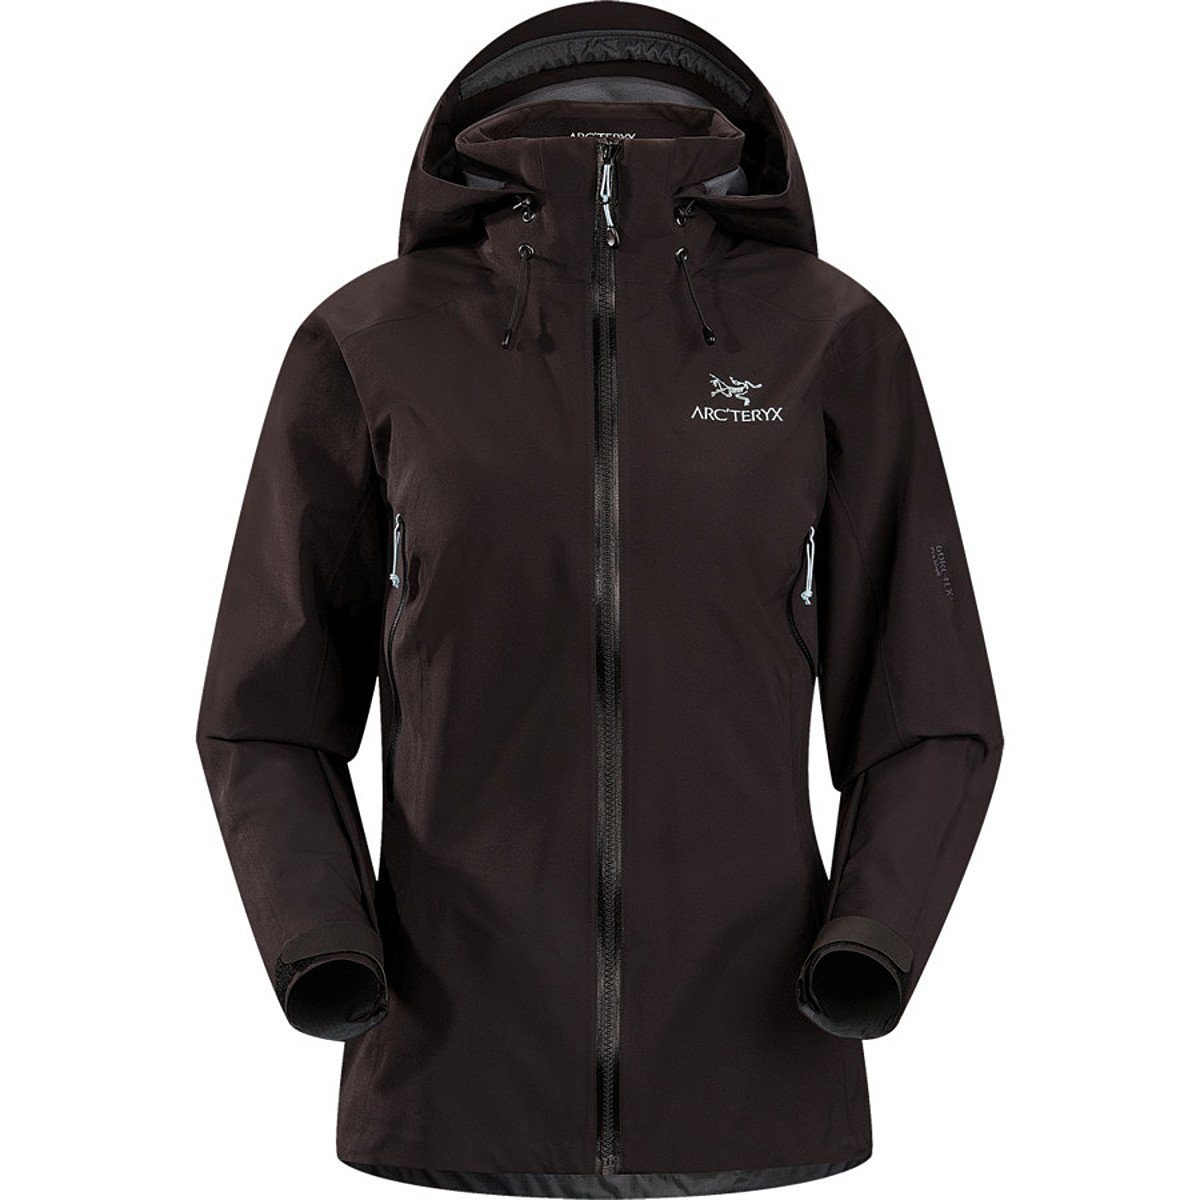 496735c922 Amazon.com  Arc teryx Beta AR Jacket - Women s Black